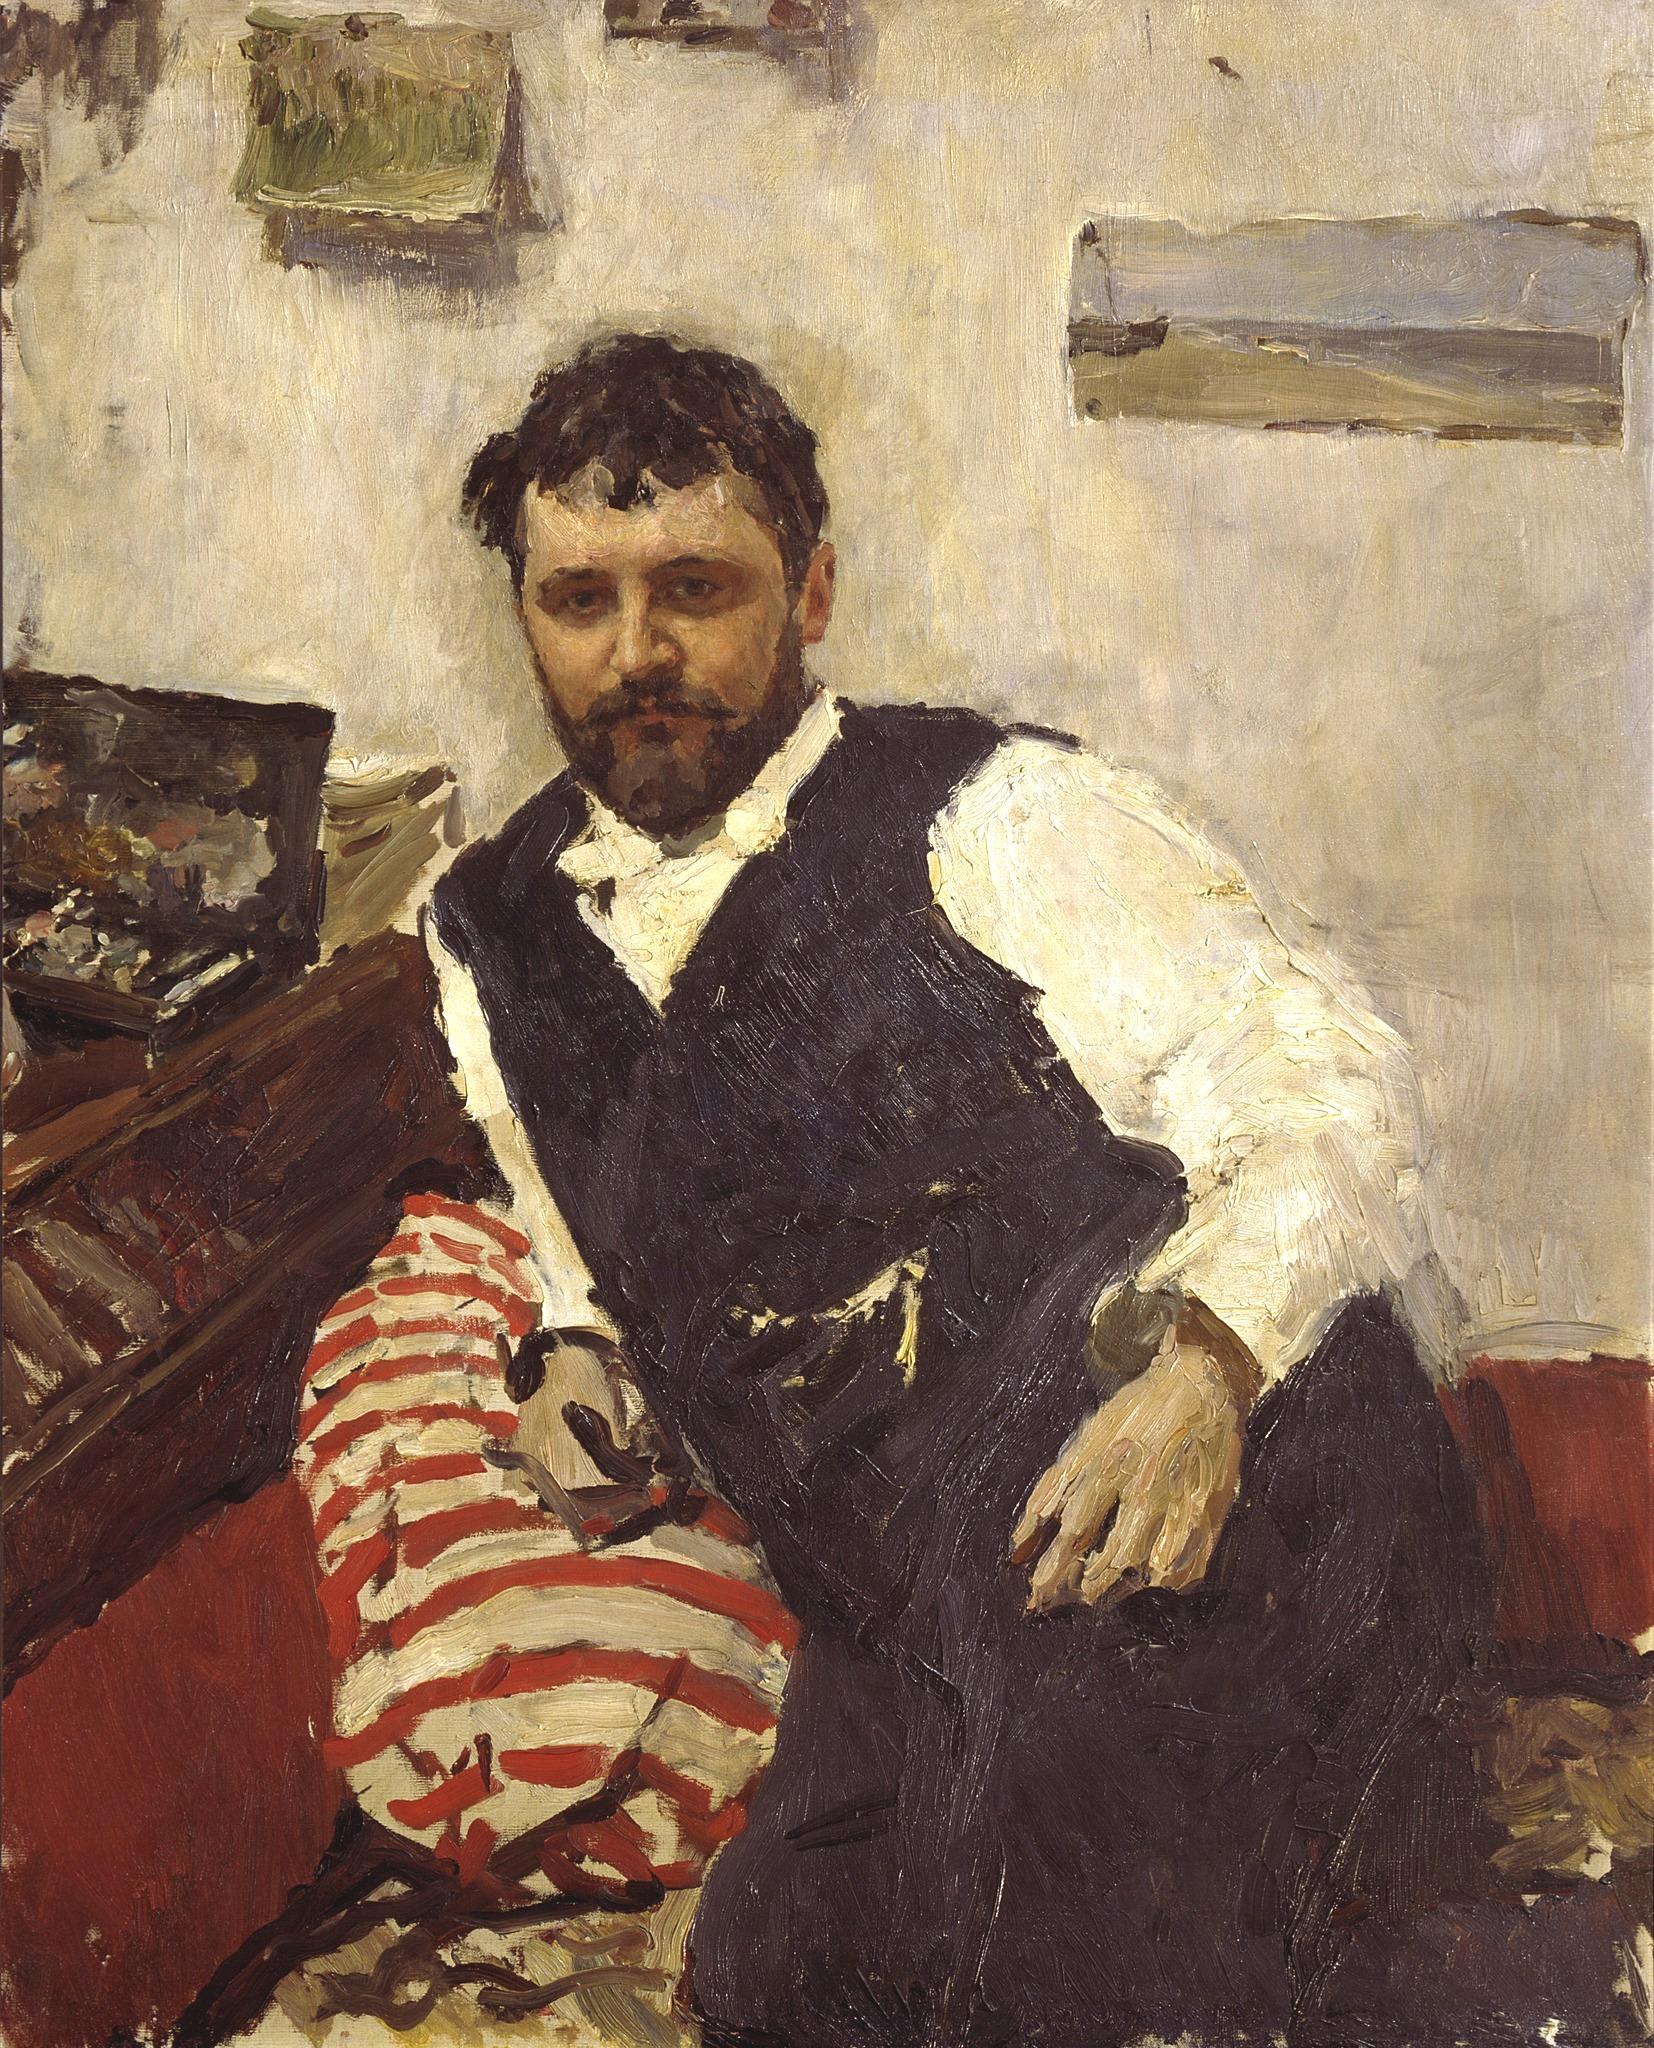 Валентин Серов. Портрет Константина Коровина. 1891. Источник: wikipedia.org